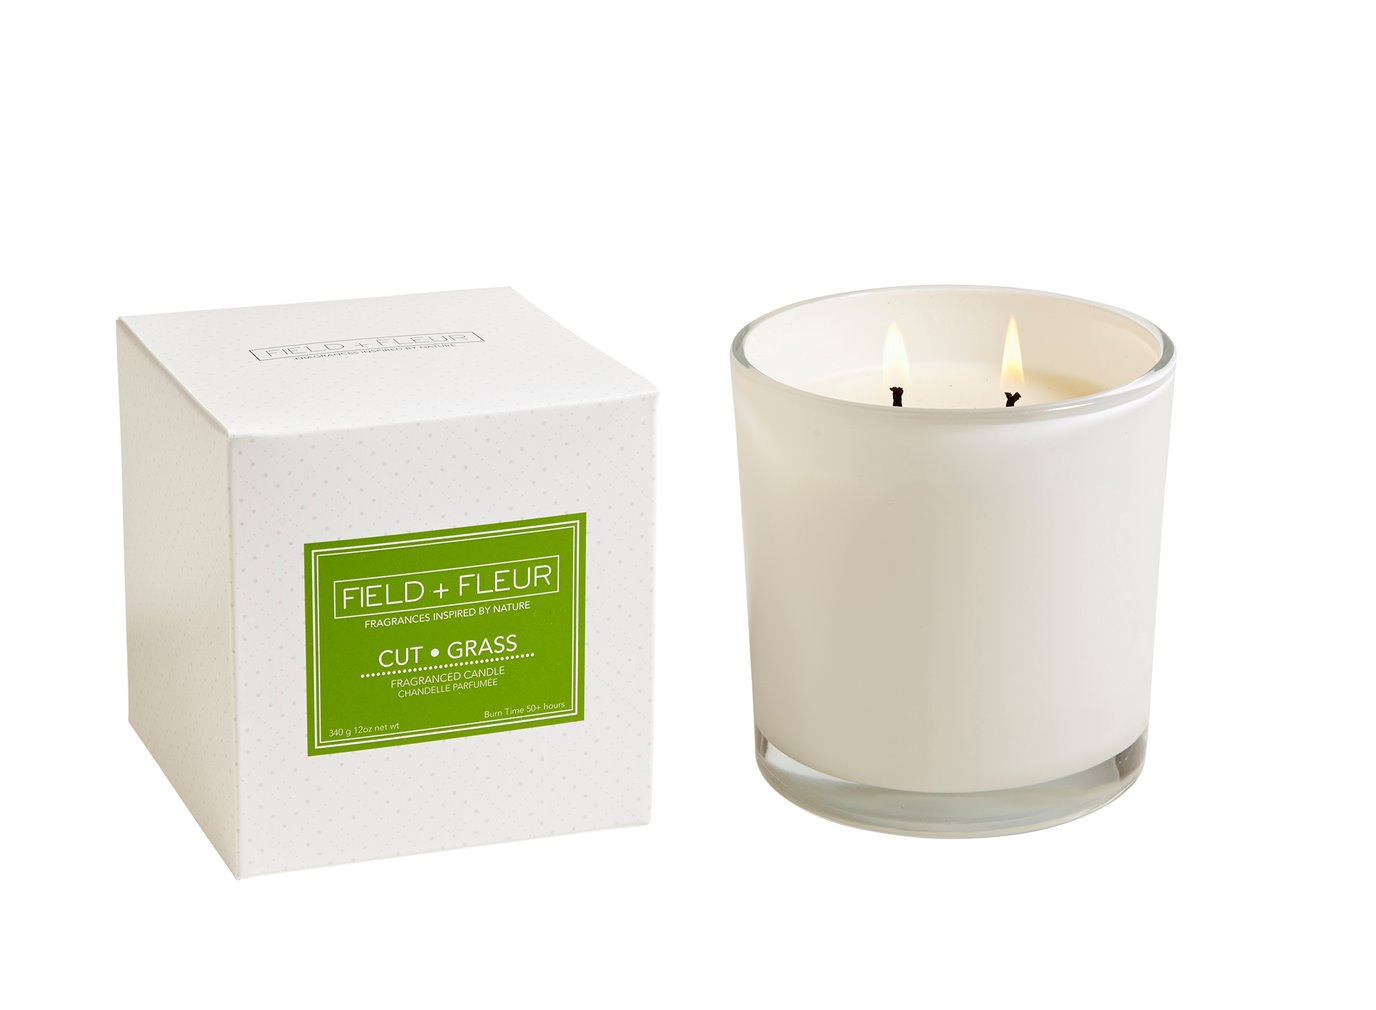 FIELD + FLEUR Cut Grass 2 Wick Candle In White Glass 12 oz